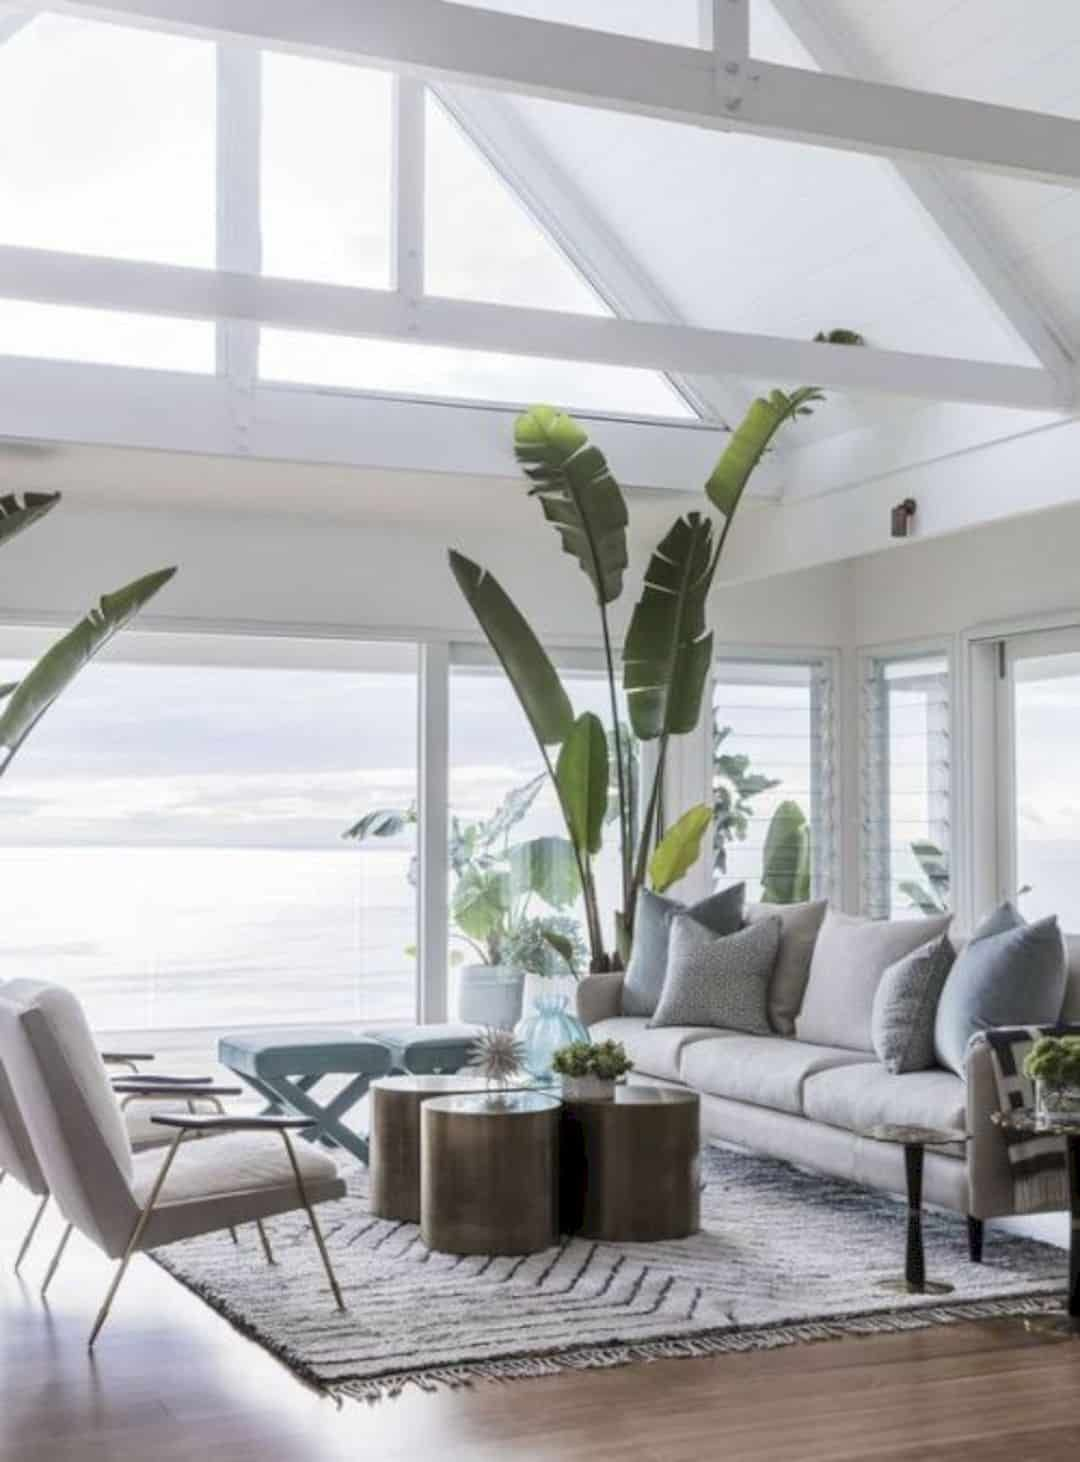 17 Coastal Room Decoration Ideas Coastal Living Rooms Beach House Decor Coastal Room